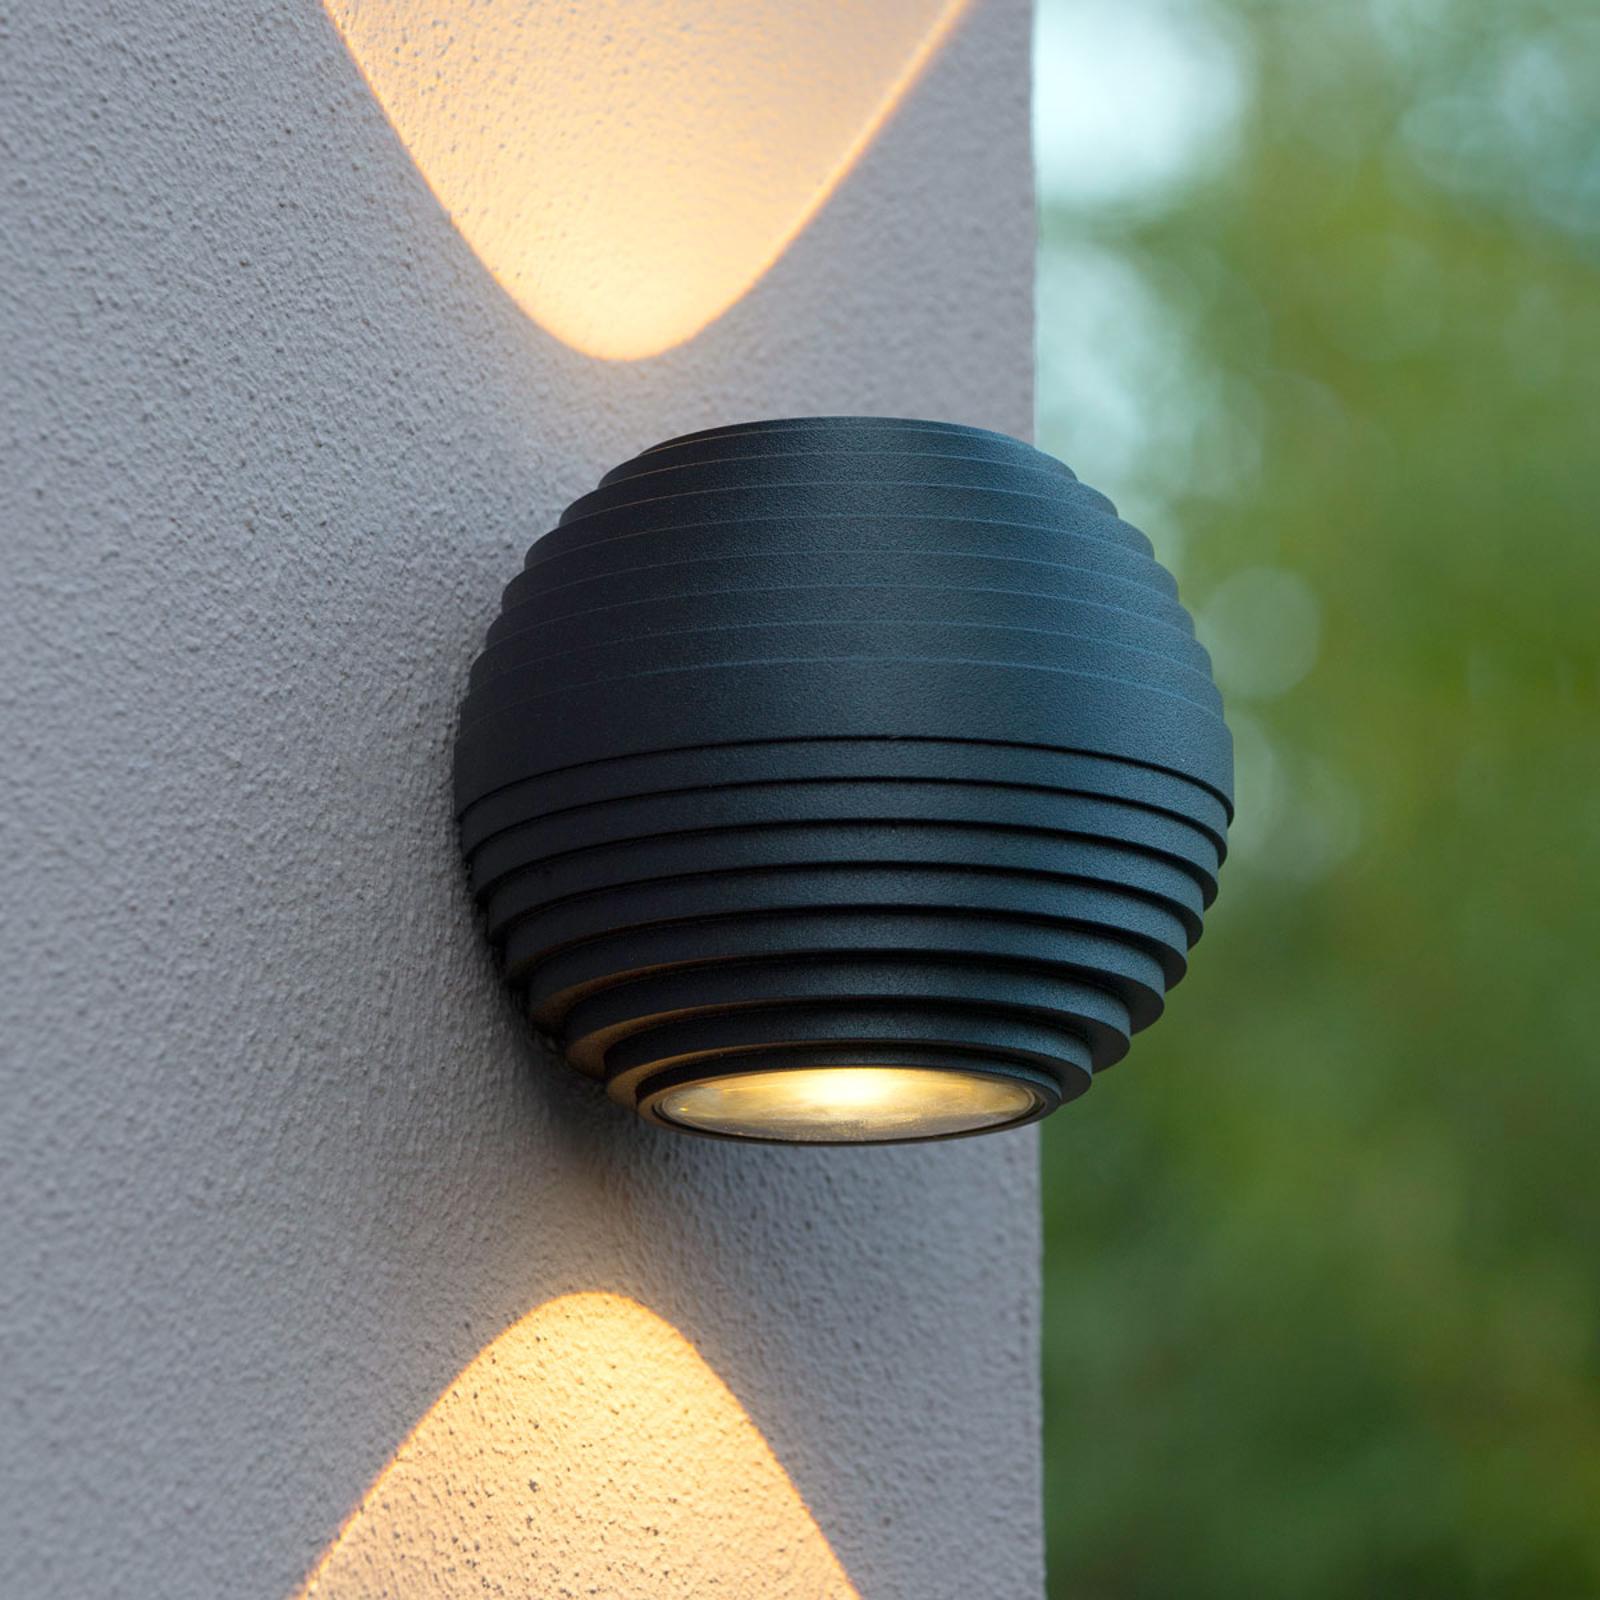 Runde LED-Außenwandleuchte Ayo, 2-flammig